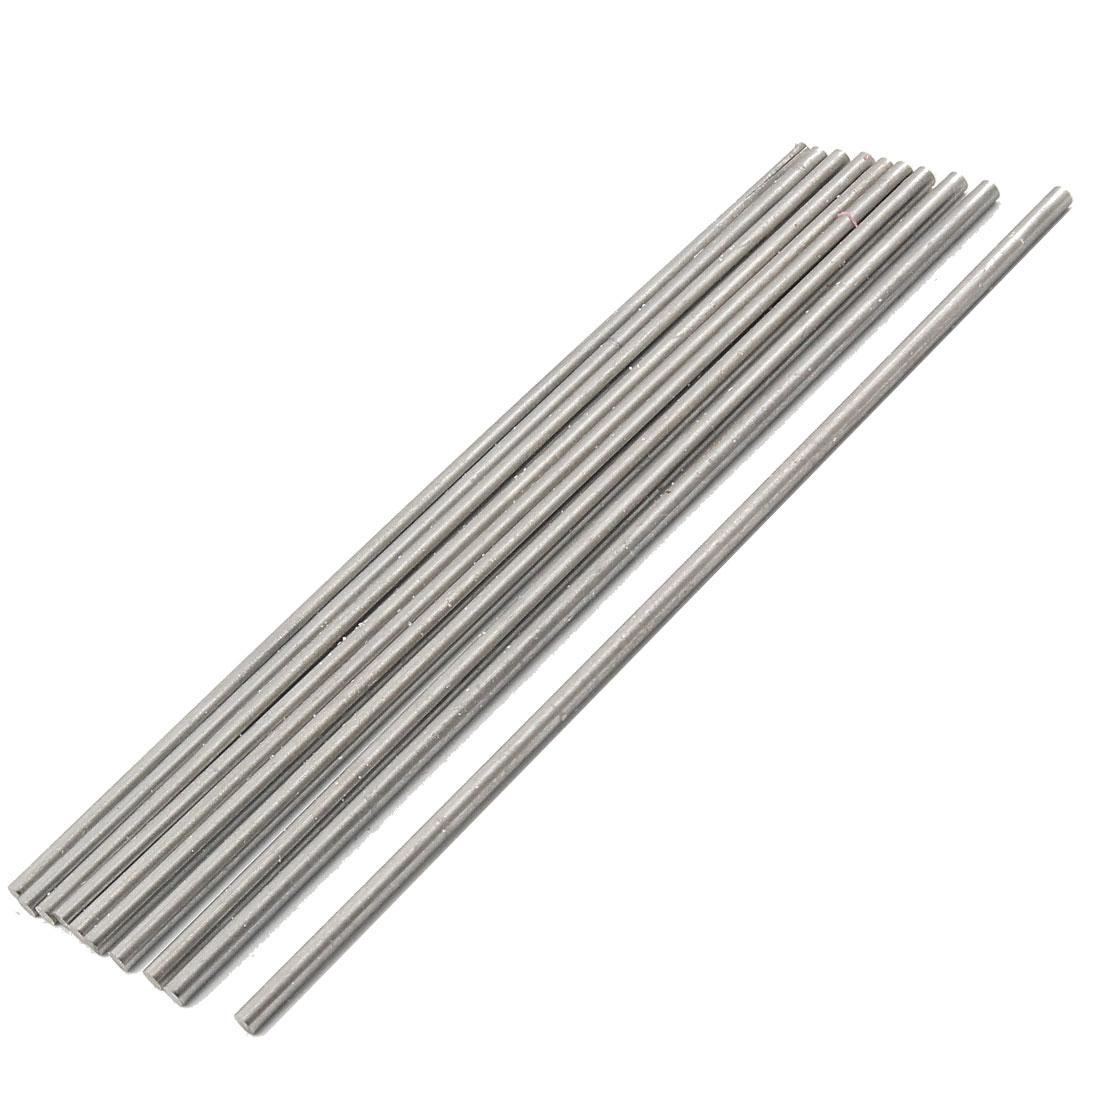 "3.9"" x 2/25"" High Speed Steel HSS Lathe Turning Tool Bar 10 Pcs"